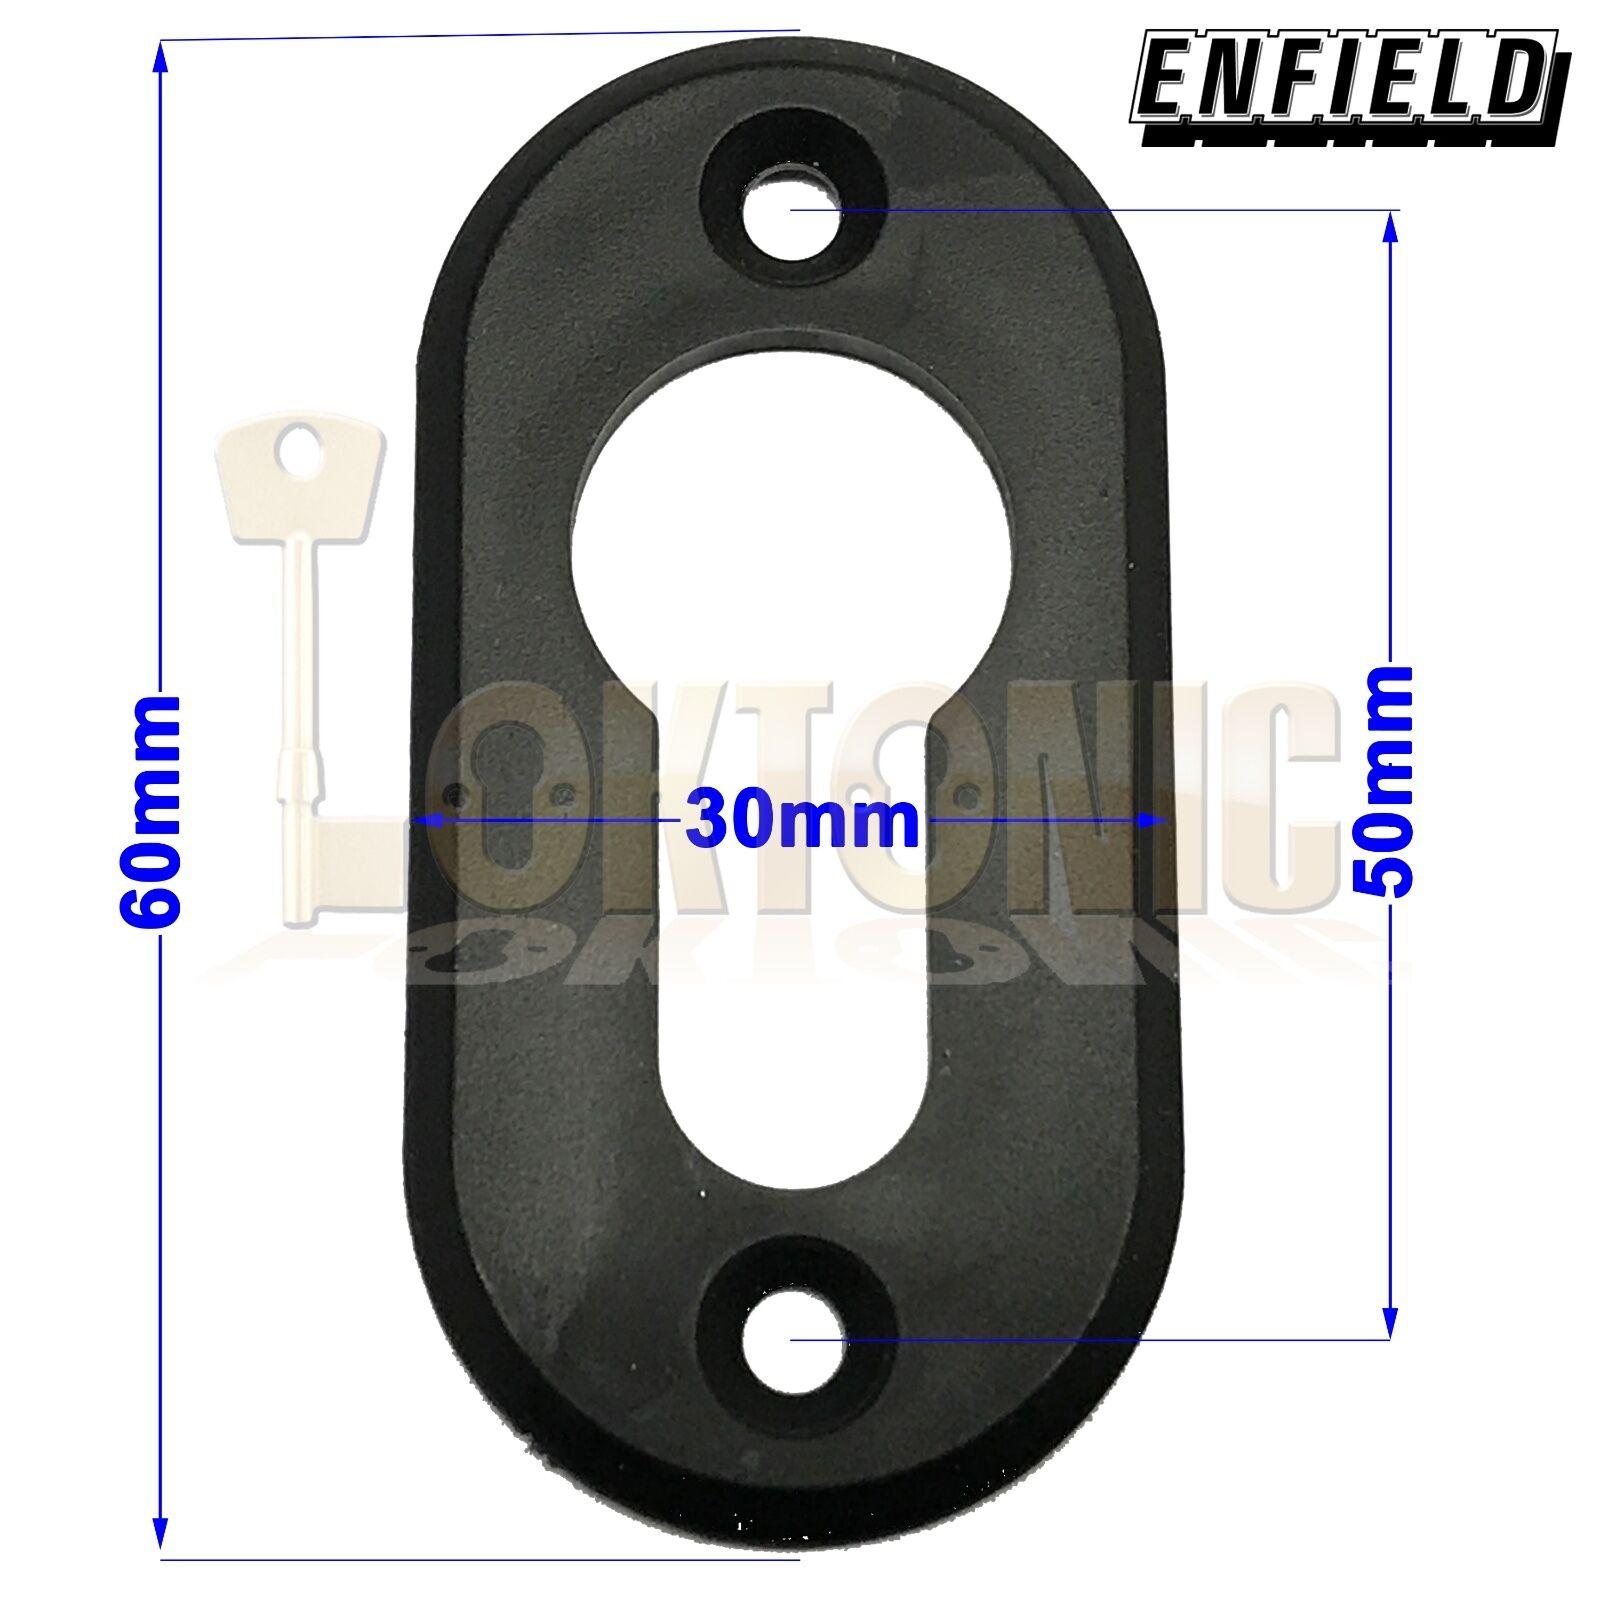 Enfield Black Plastic Euro Cylinder Escutcheon Keyhole